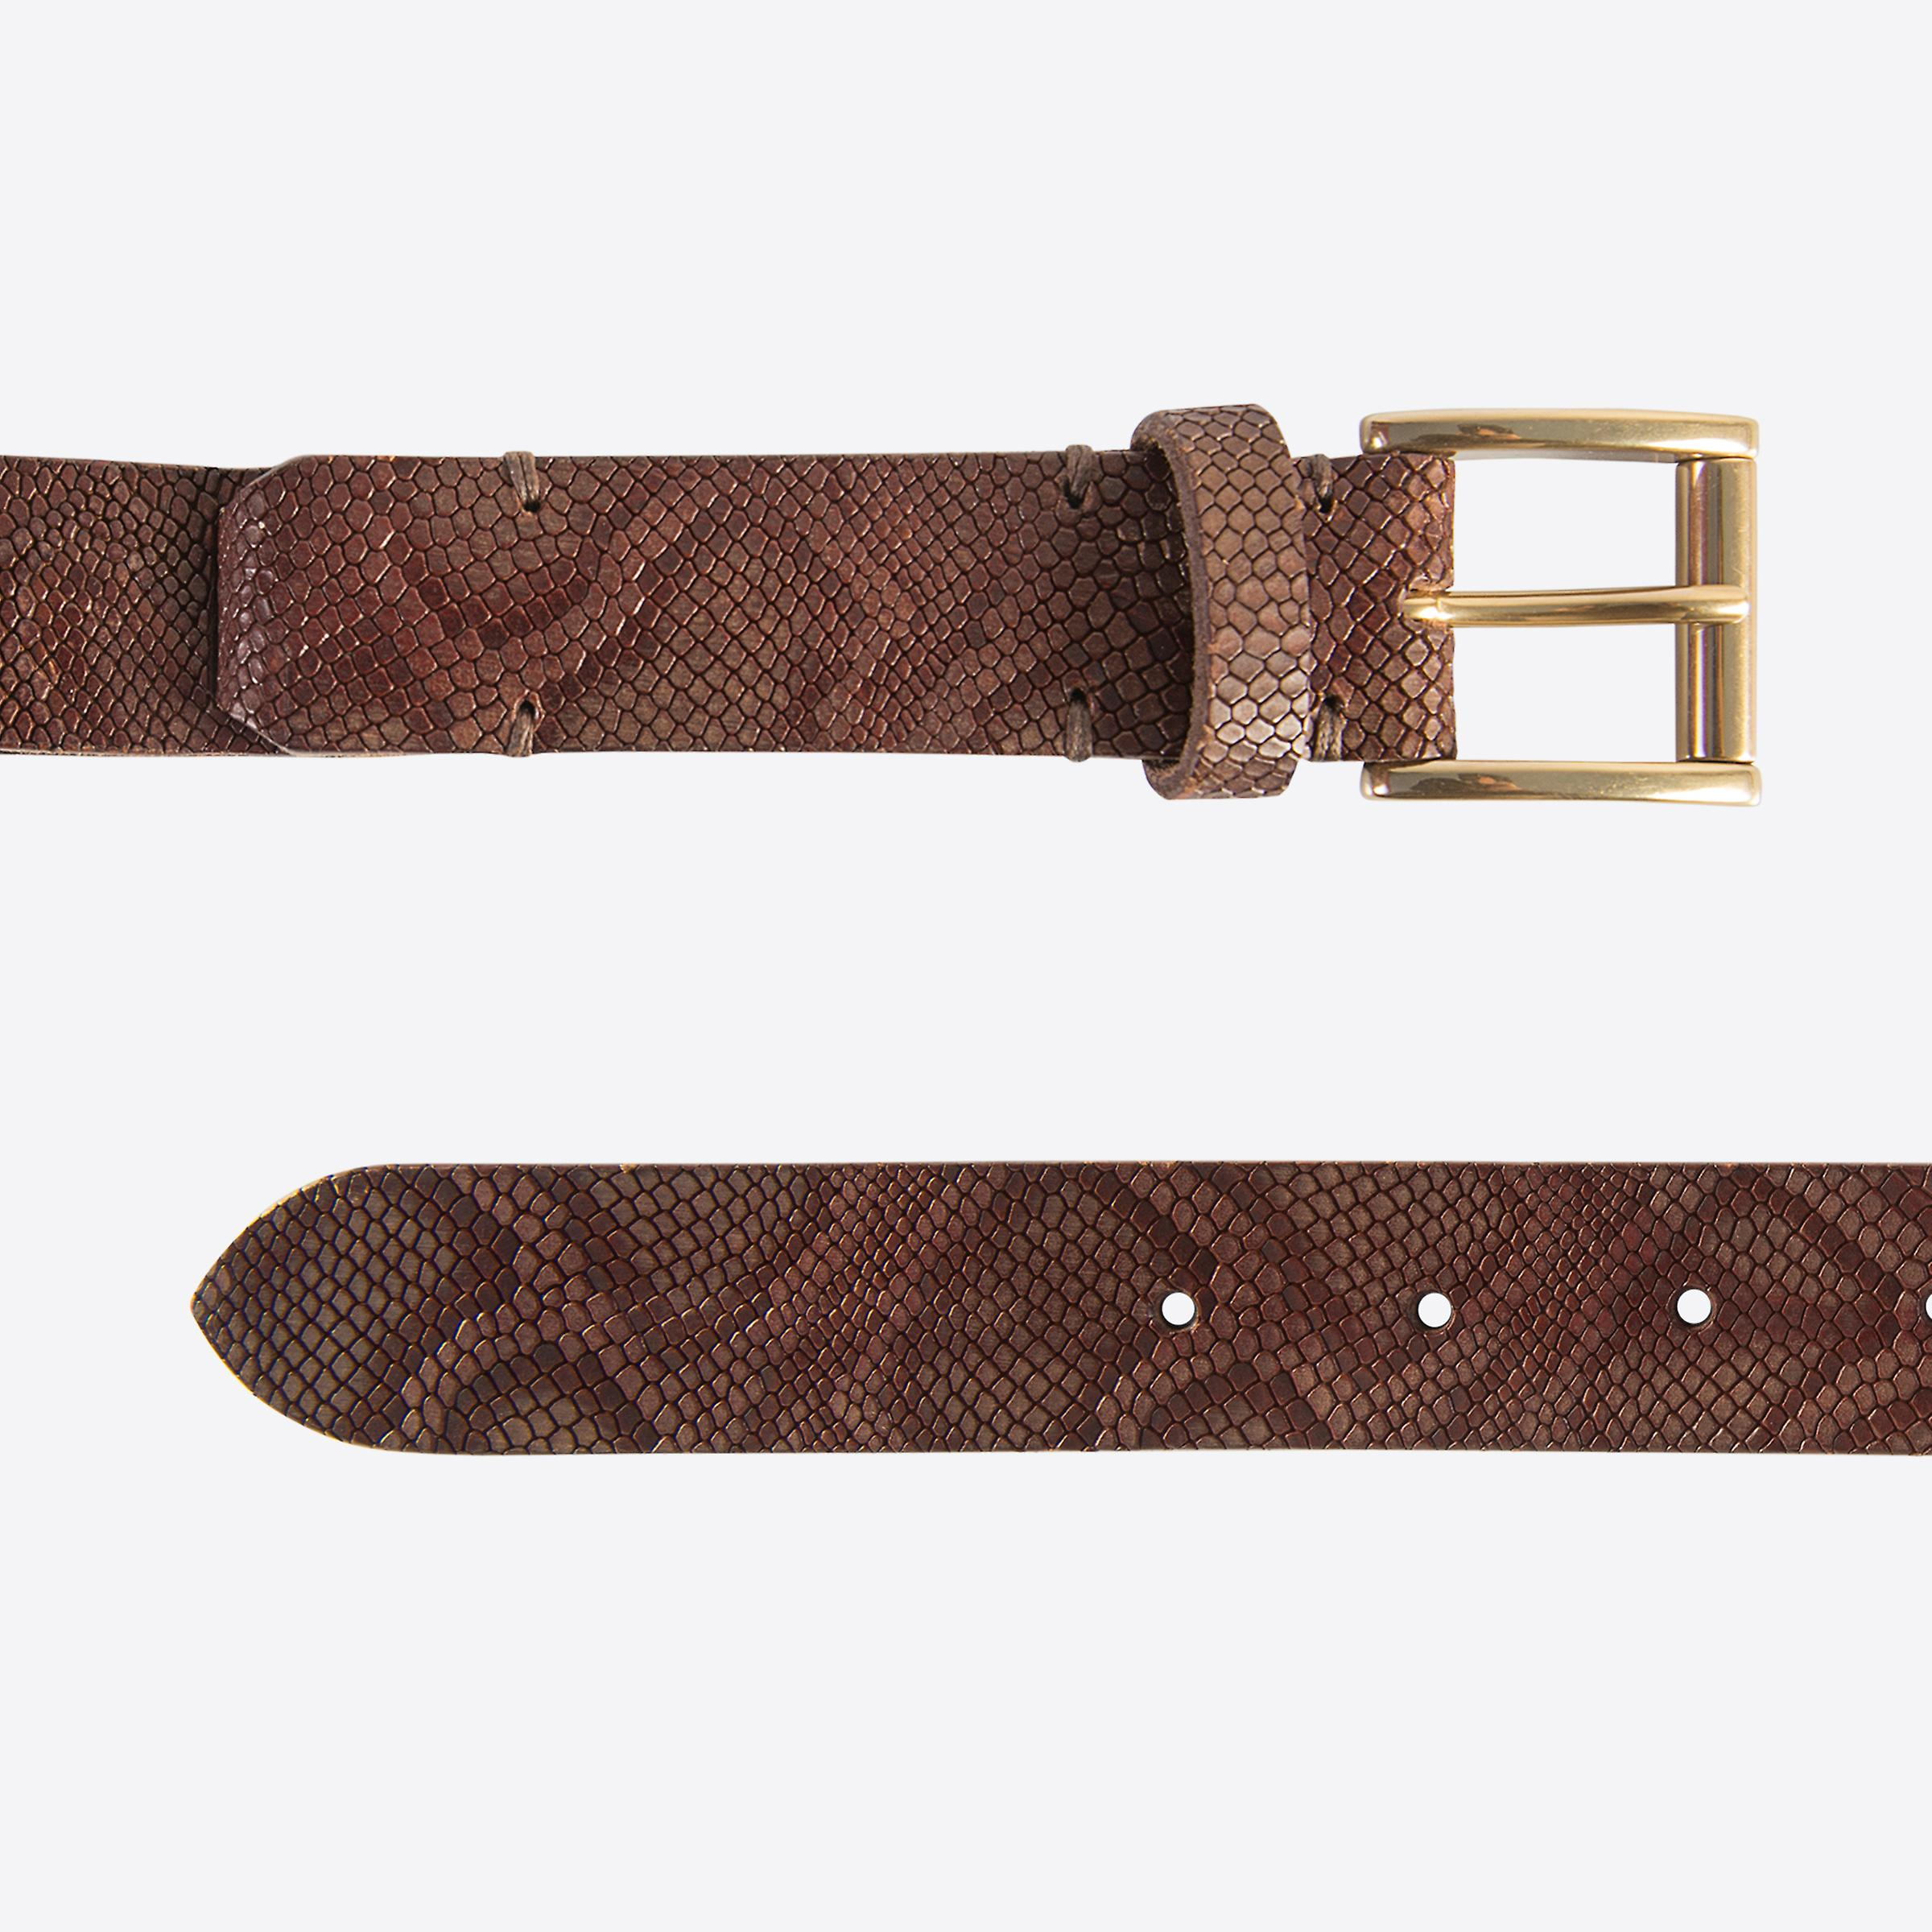 Fabio Giovanni Novali Gürtel - Python Print Belt - hochwertige italienische Gürtel